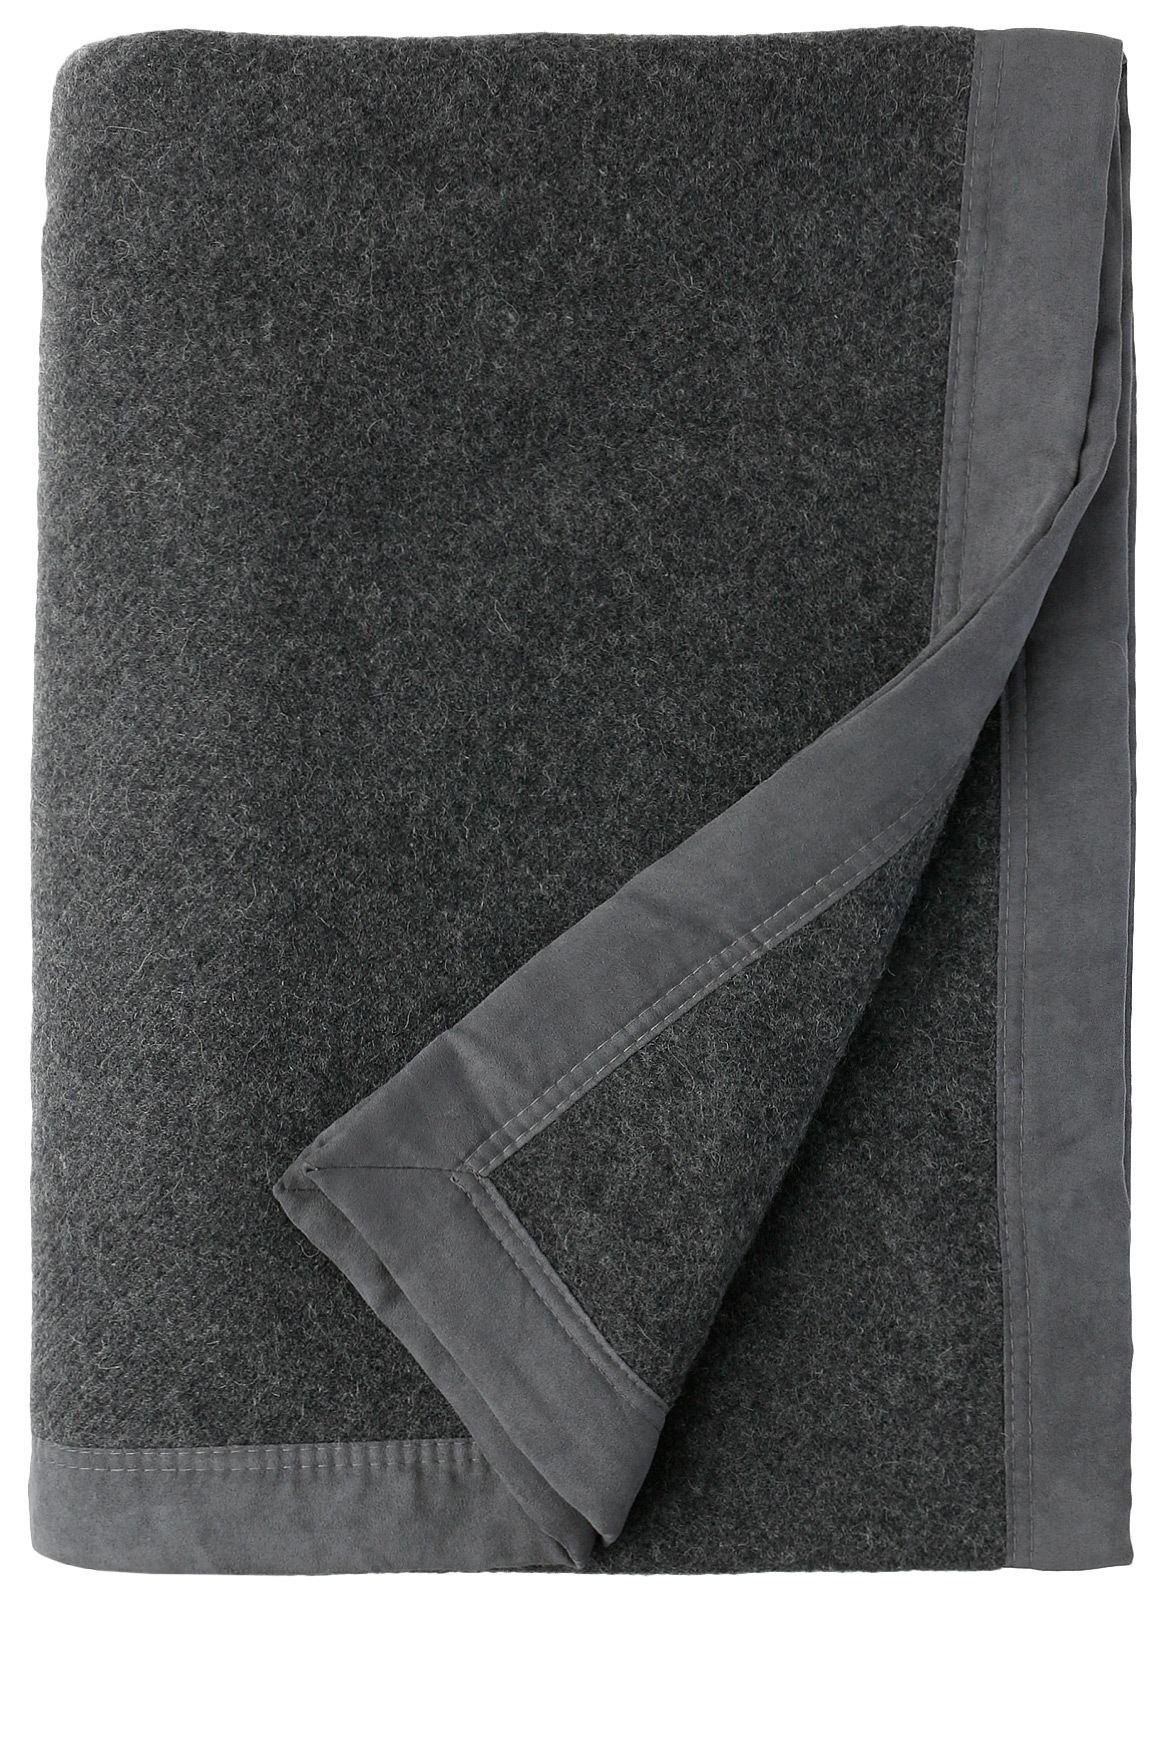 australian house u0026 garden merino wool blanket in charcoal myer online